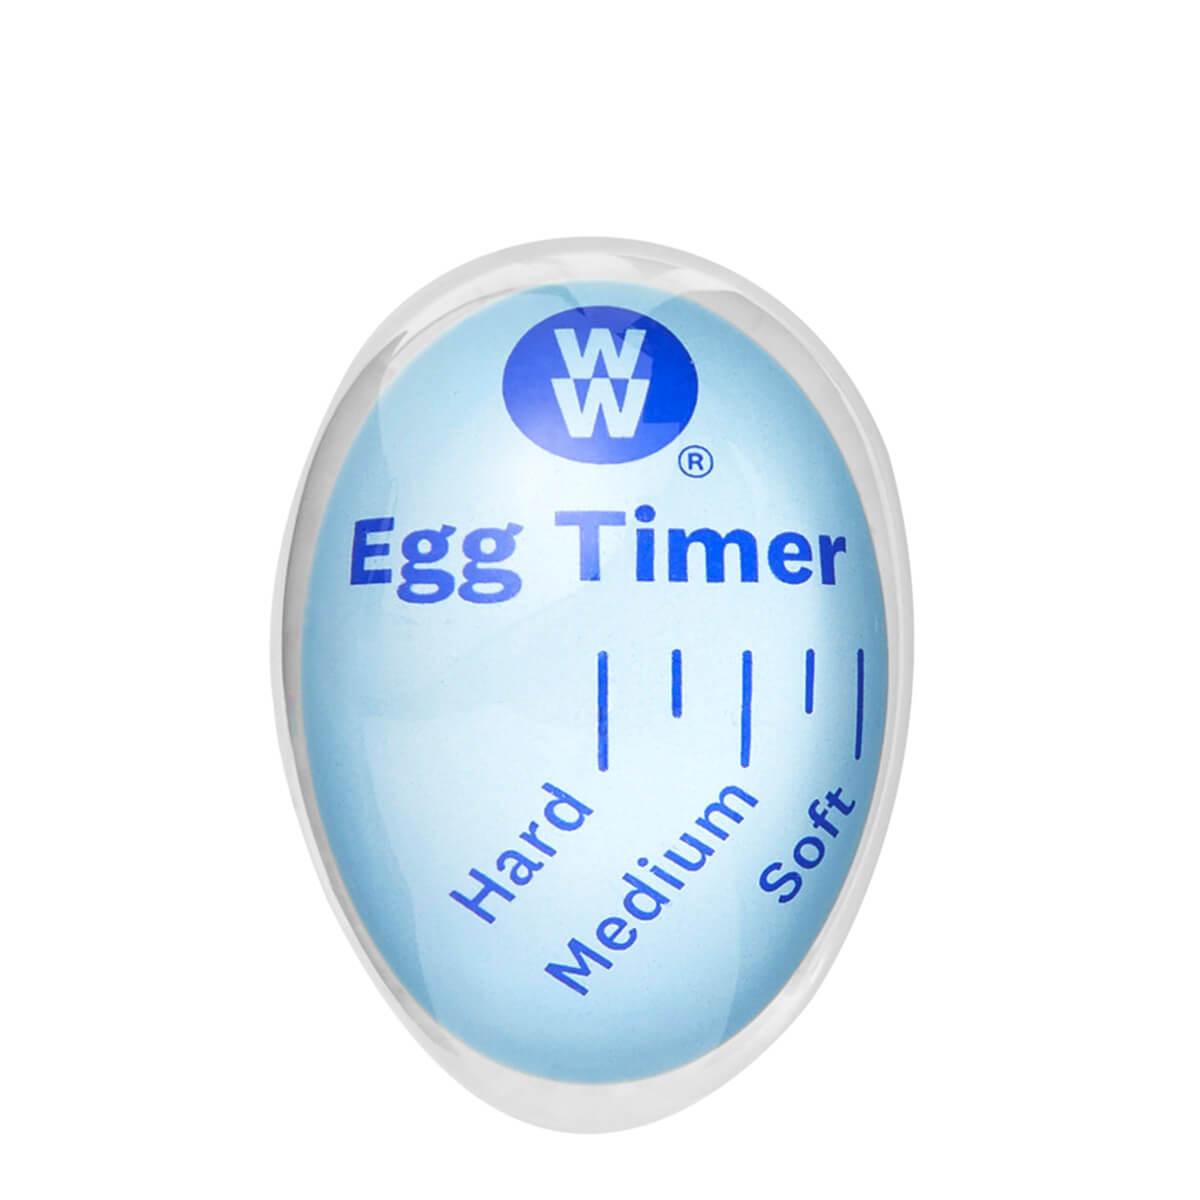 Boiled Egg Timer - no packaging